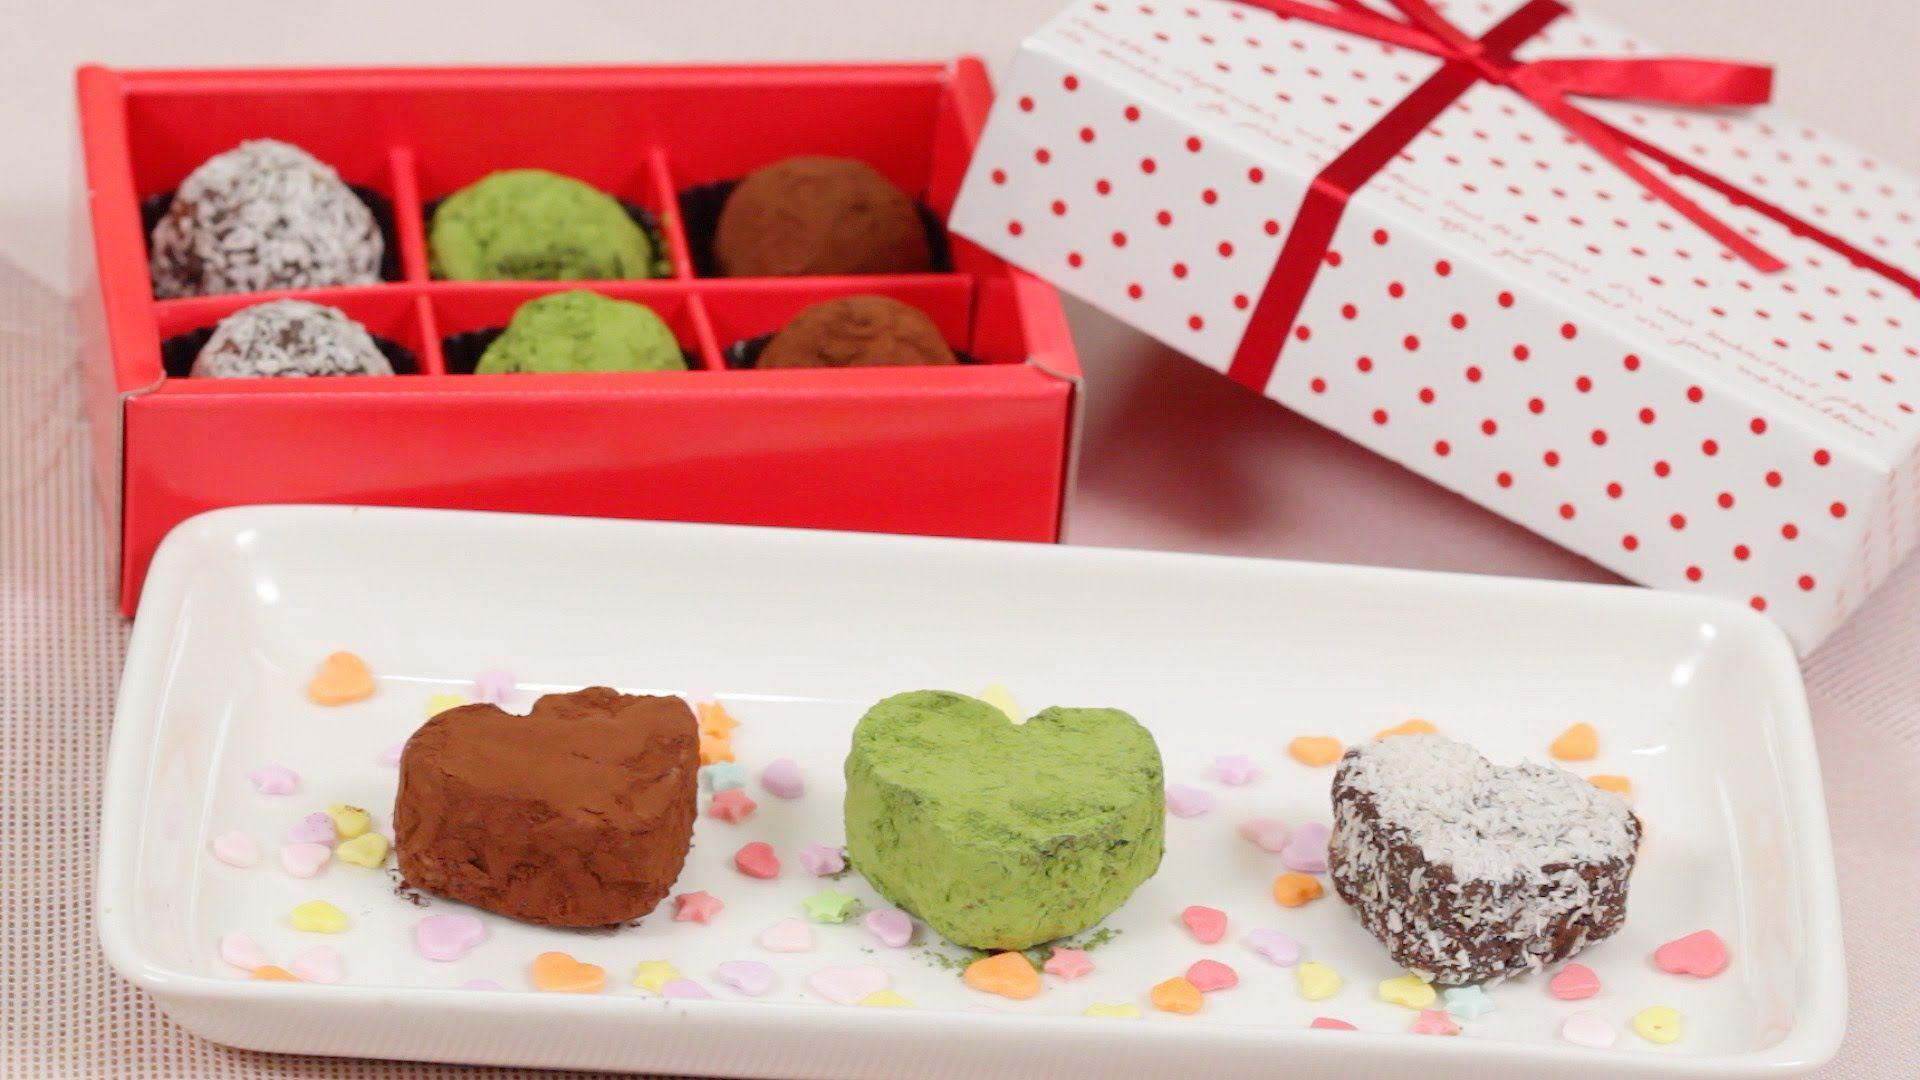 Chocolate Rum Raisin Walnut Valentines ラム酒風味レーズンナッツ